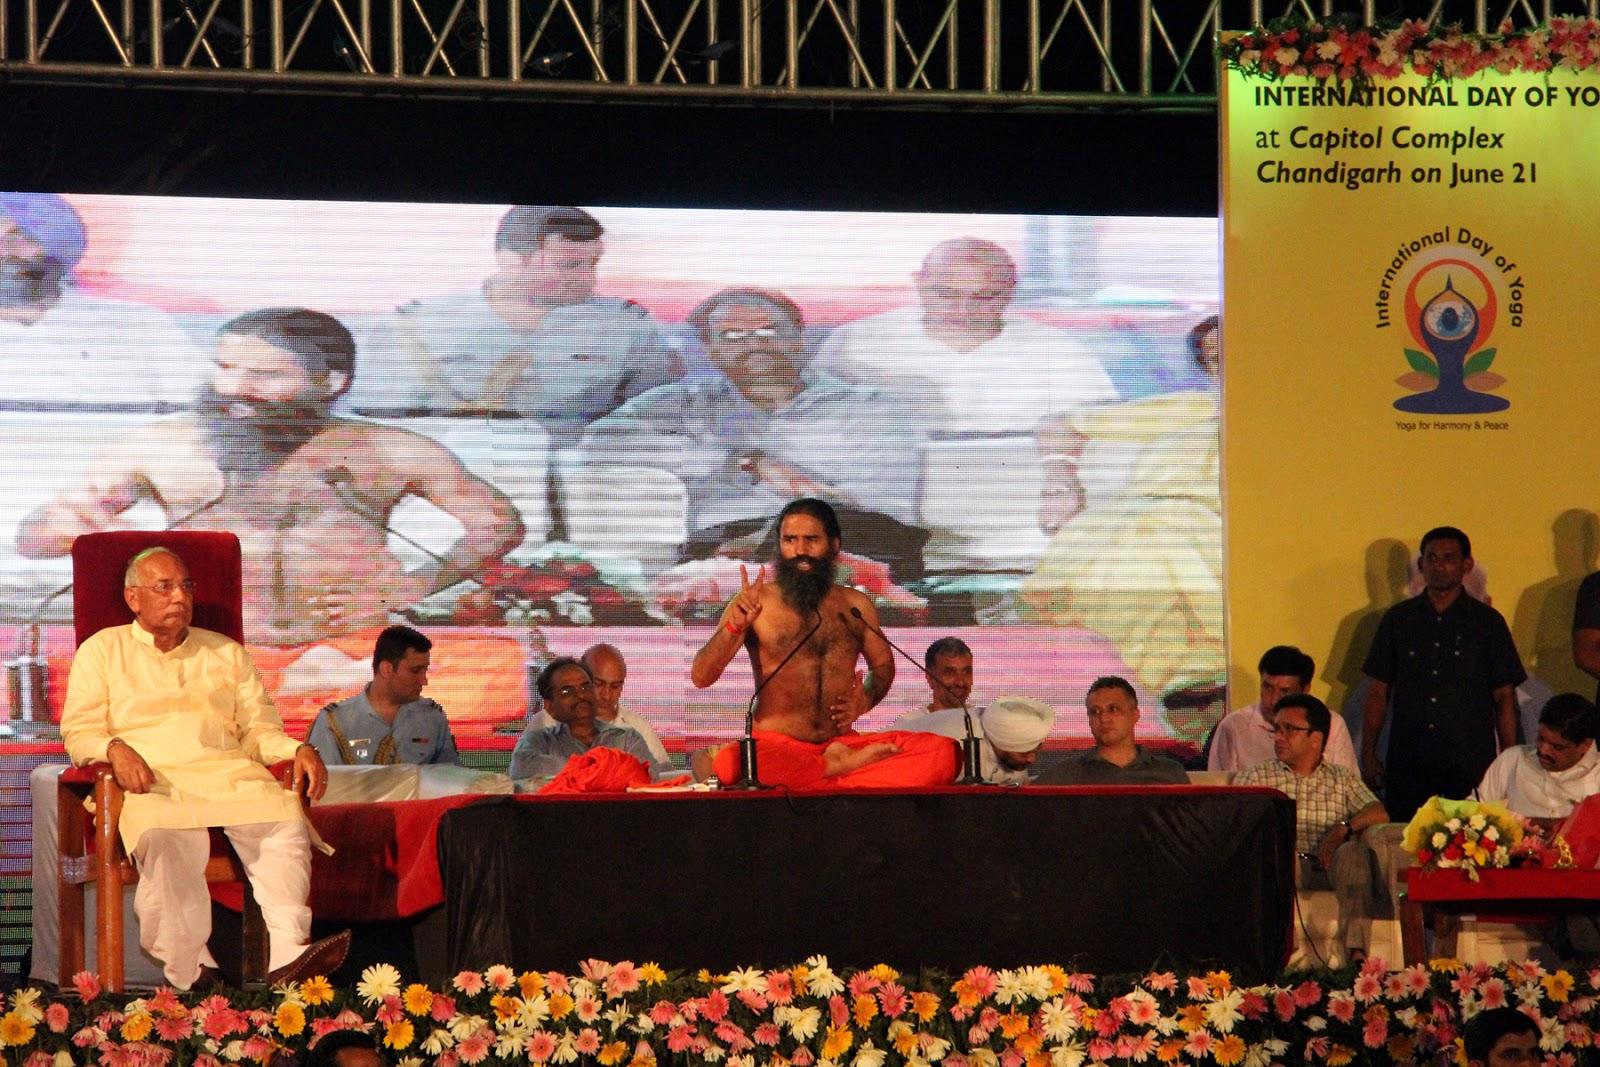 sportswire: Baba Ramdev highlights benefit of yoga